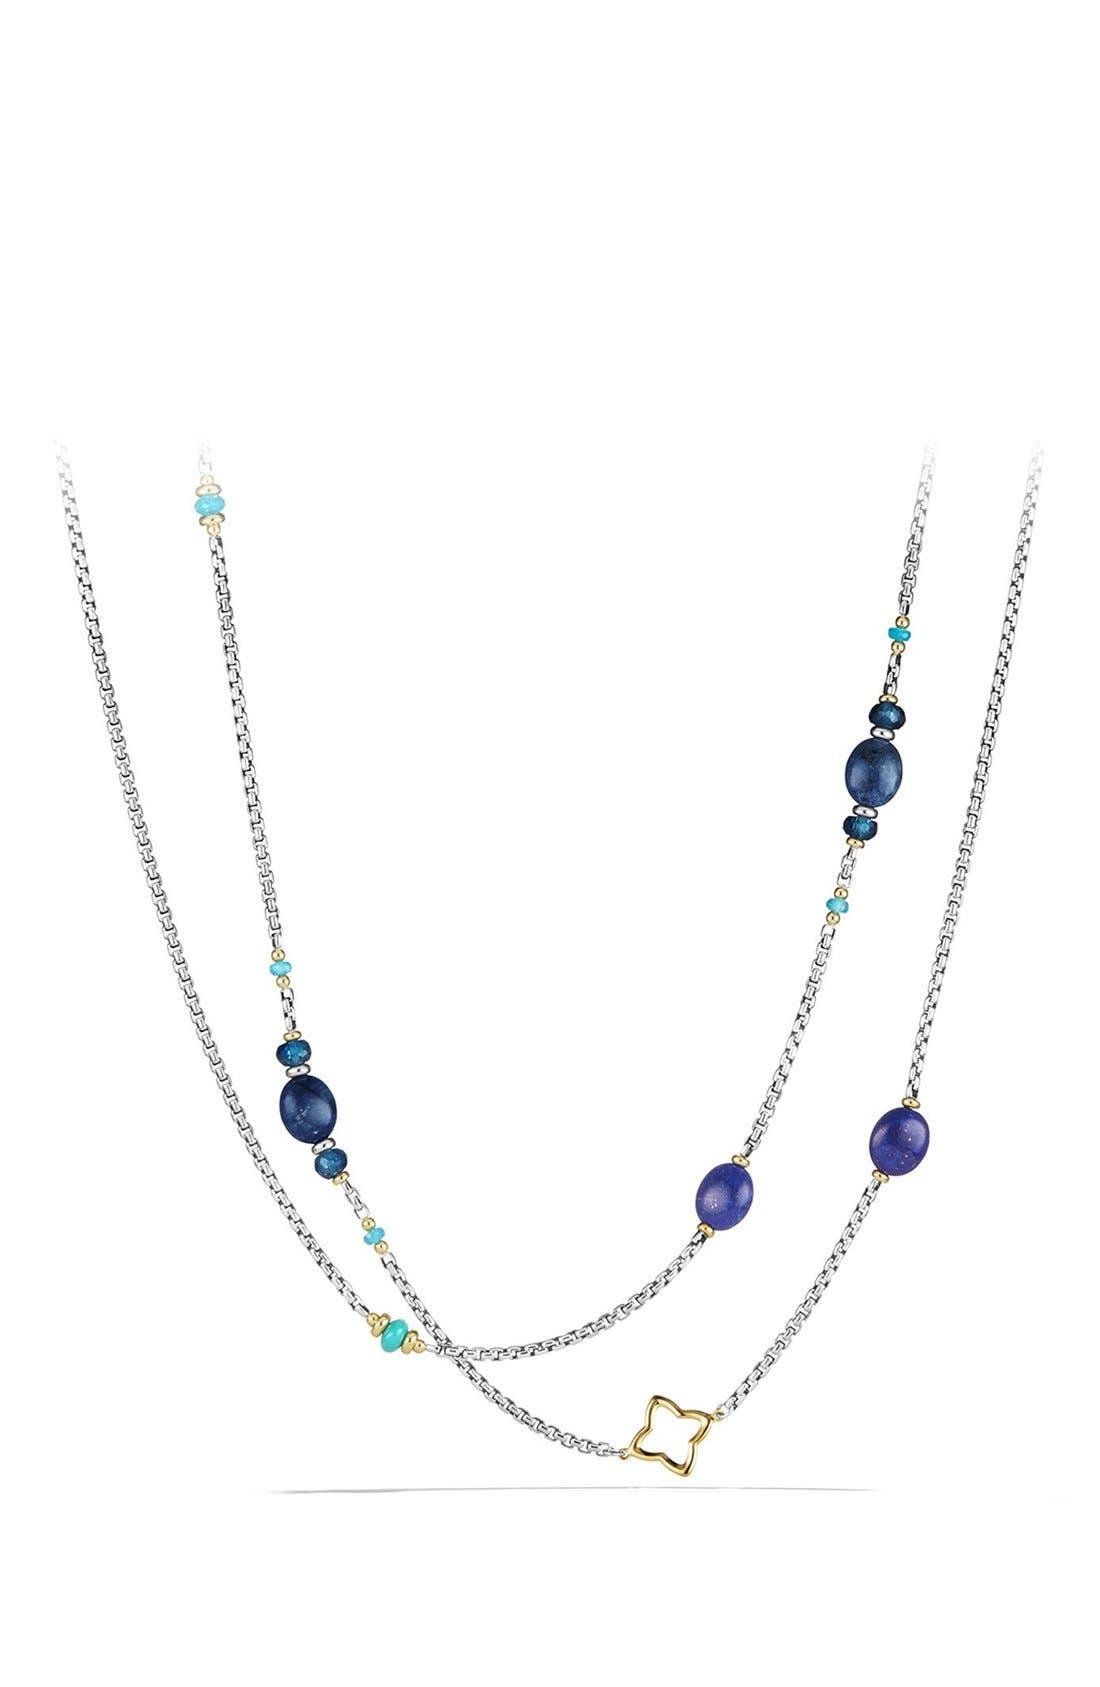 DAVID YURMAN Bead and Chain Necklace